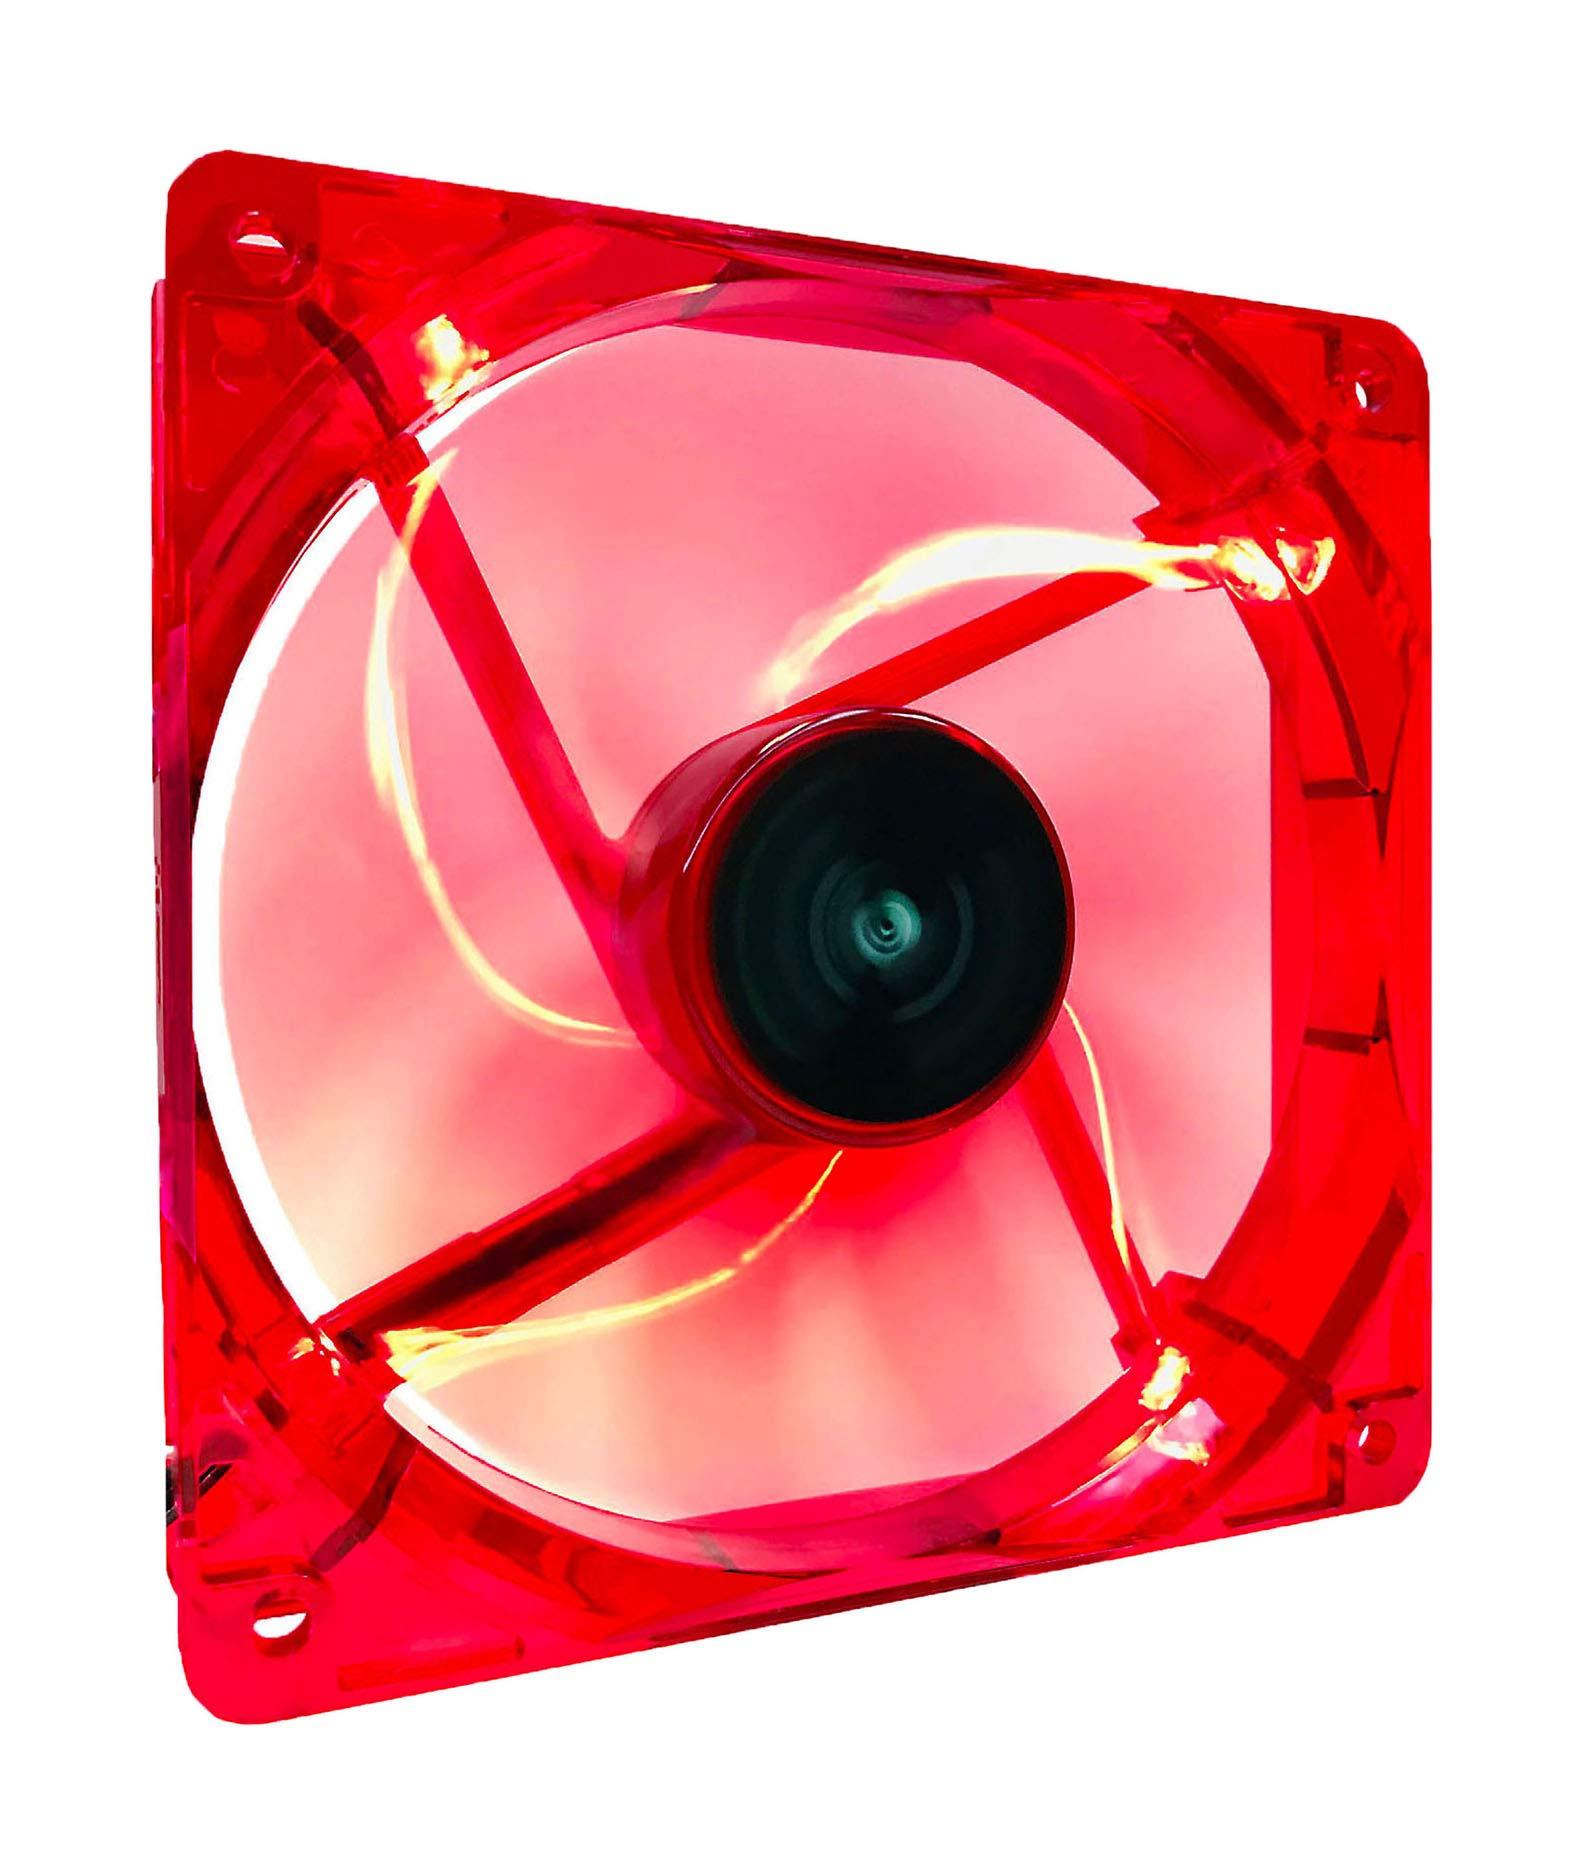 Fan Cooler Apevia 14sl-rd 140mm 4pin+3pin Silent Red Led Fan